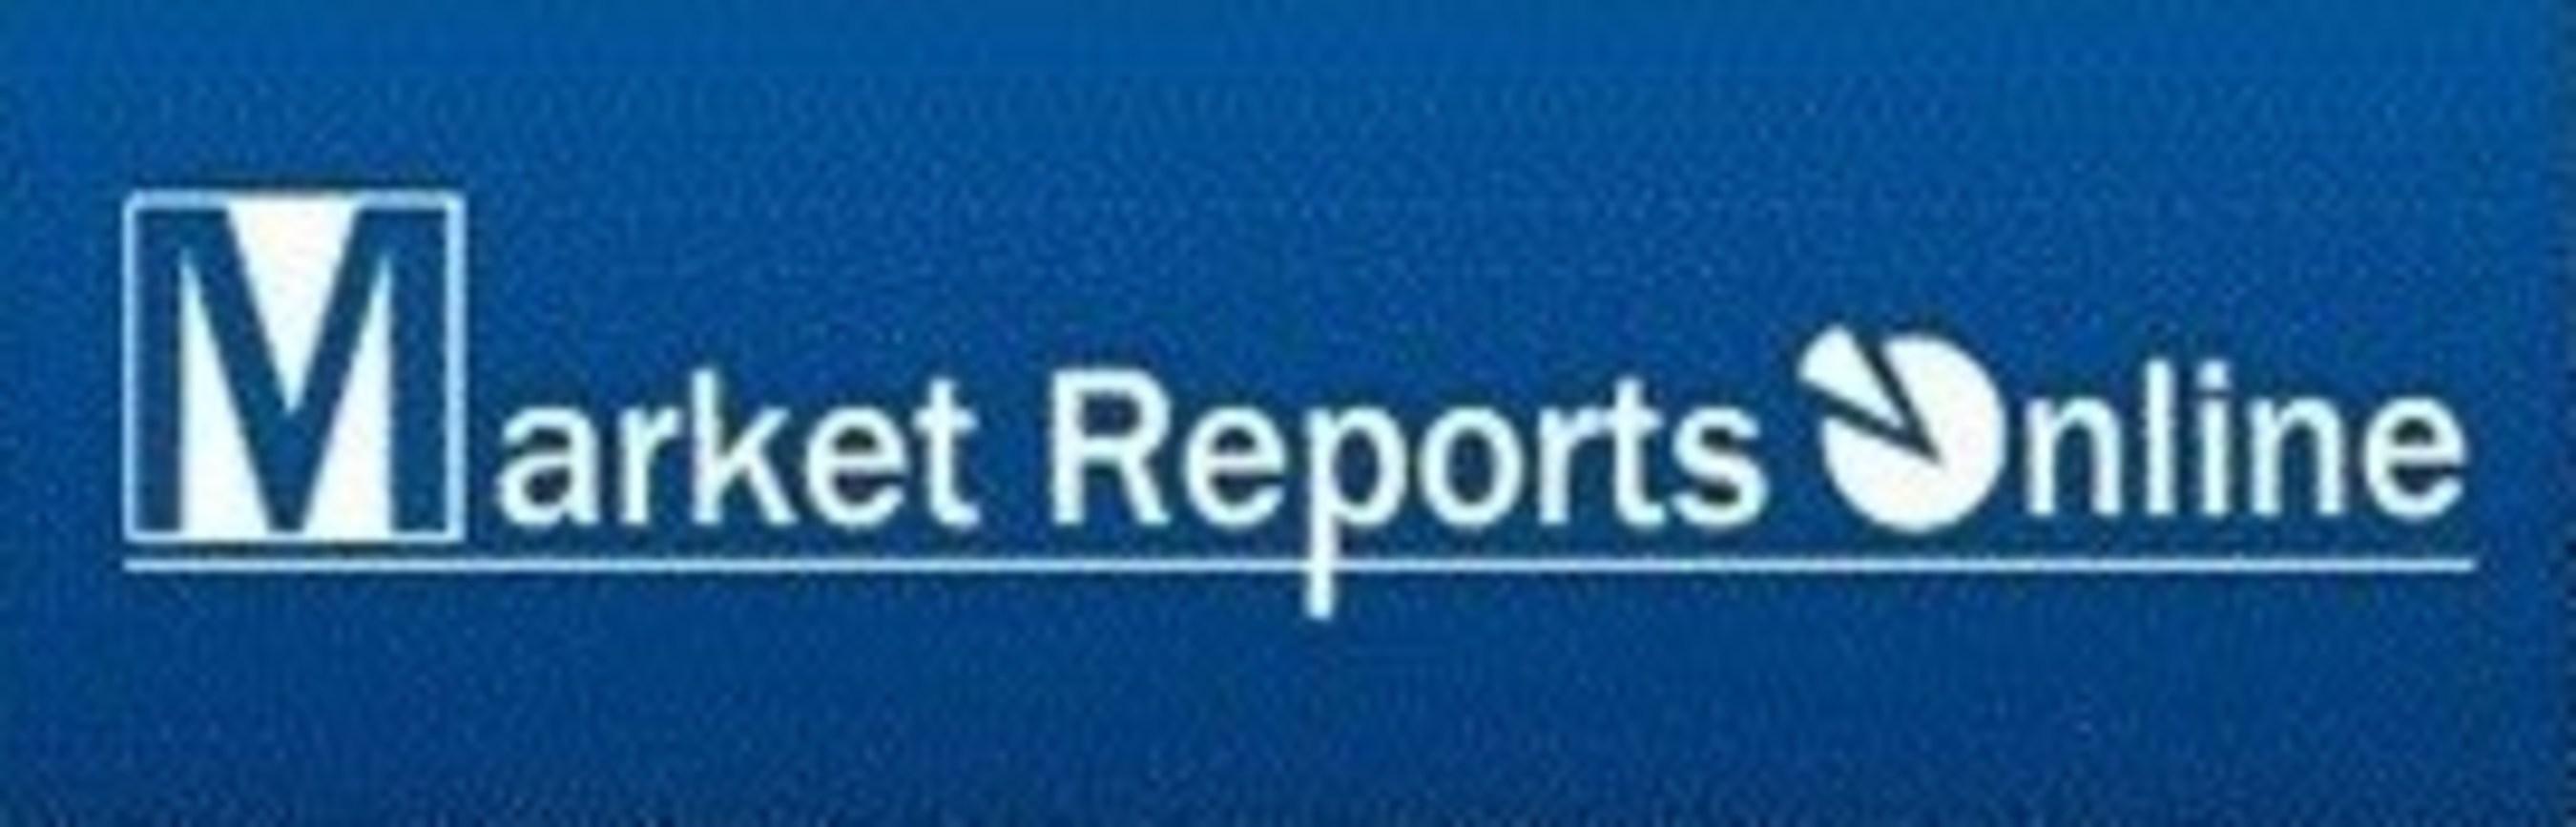 Board Portal Market Global Trends & Forecasts 2016-2020: Key Major Players are NASDAQ, Diligent, BoardEffect & BoardVantage